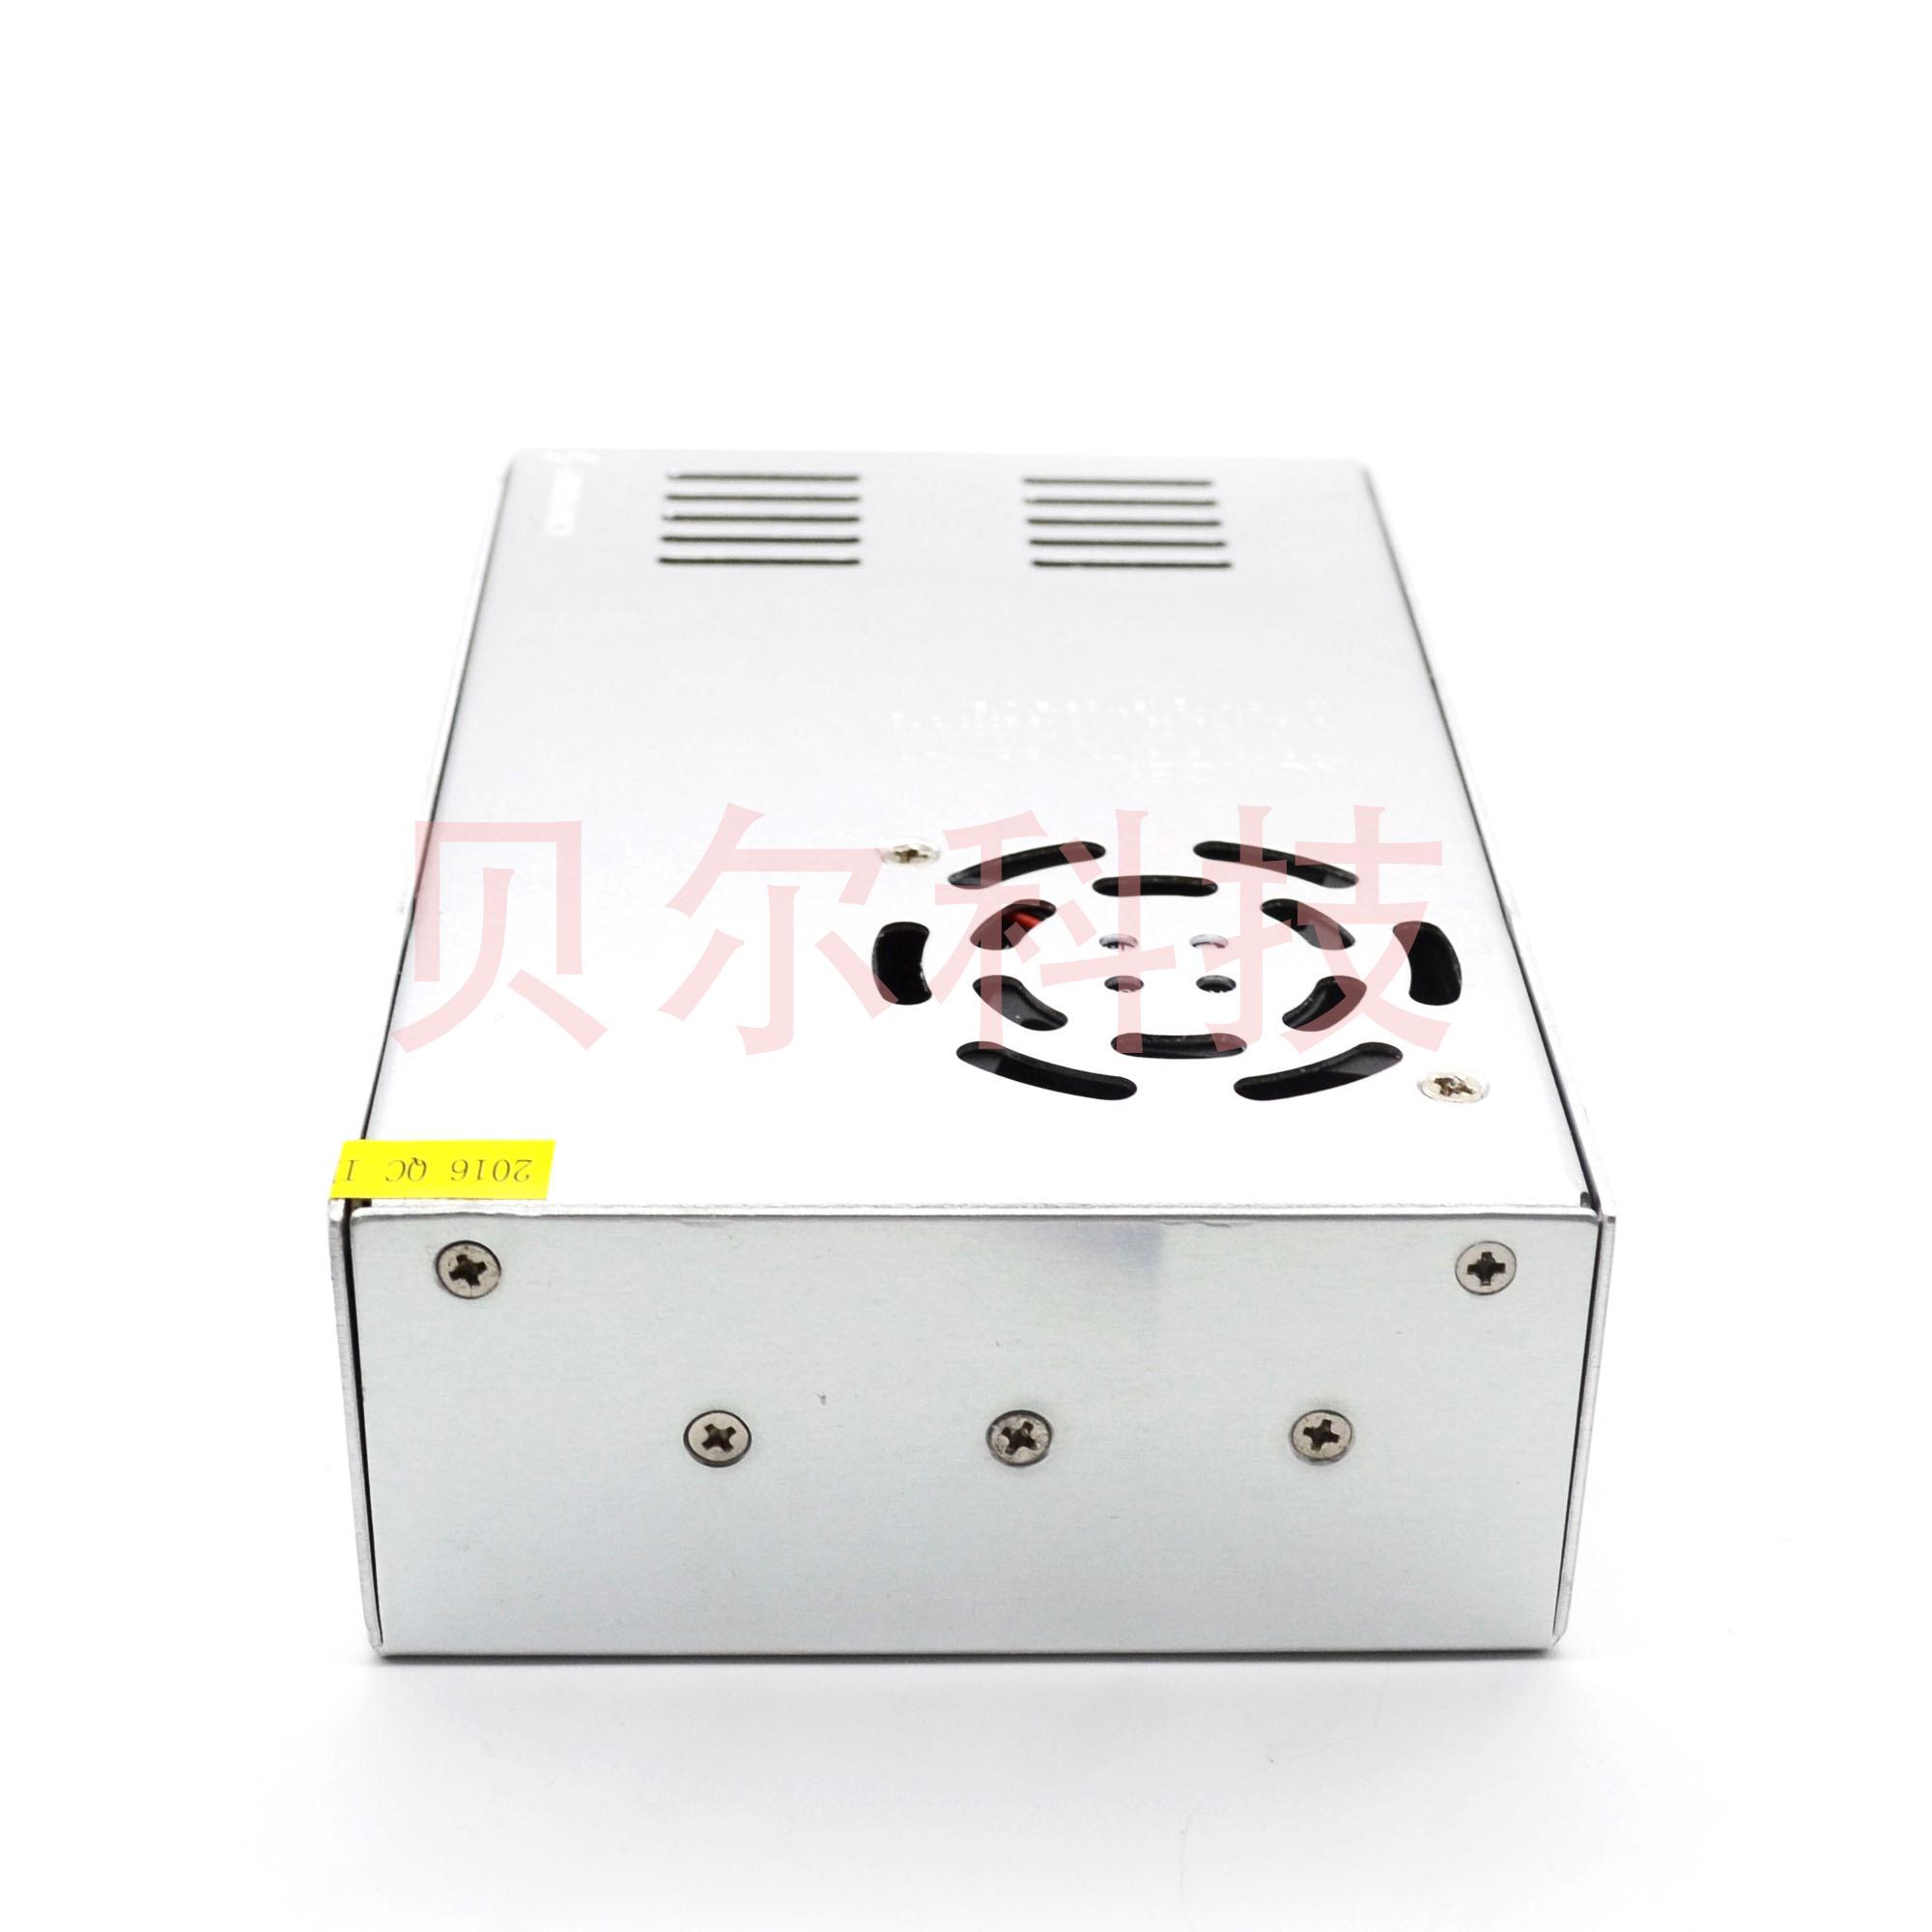 贝尔3D打印机 12V/24V 30A开关电源直流变压器360W 110v/220v切换